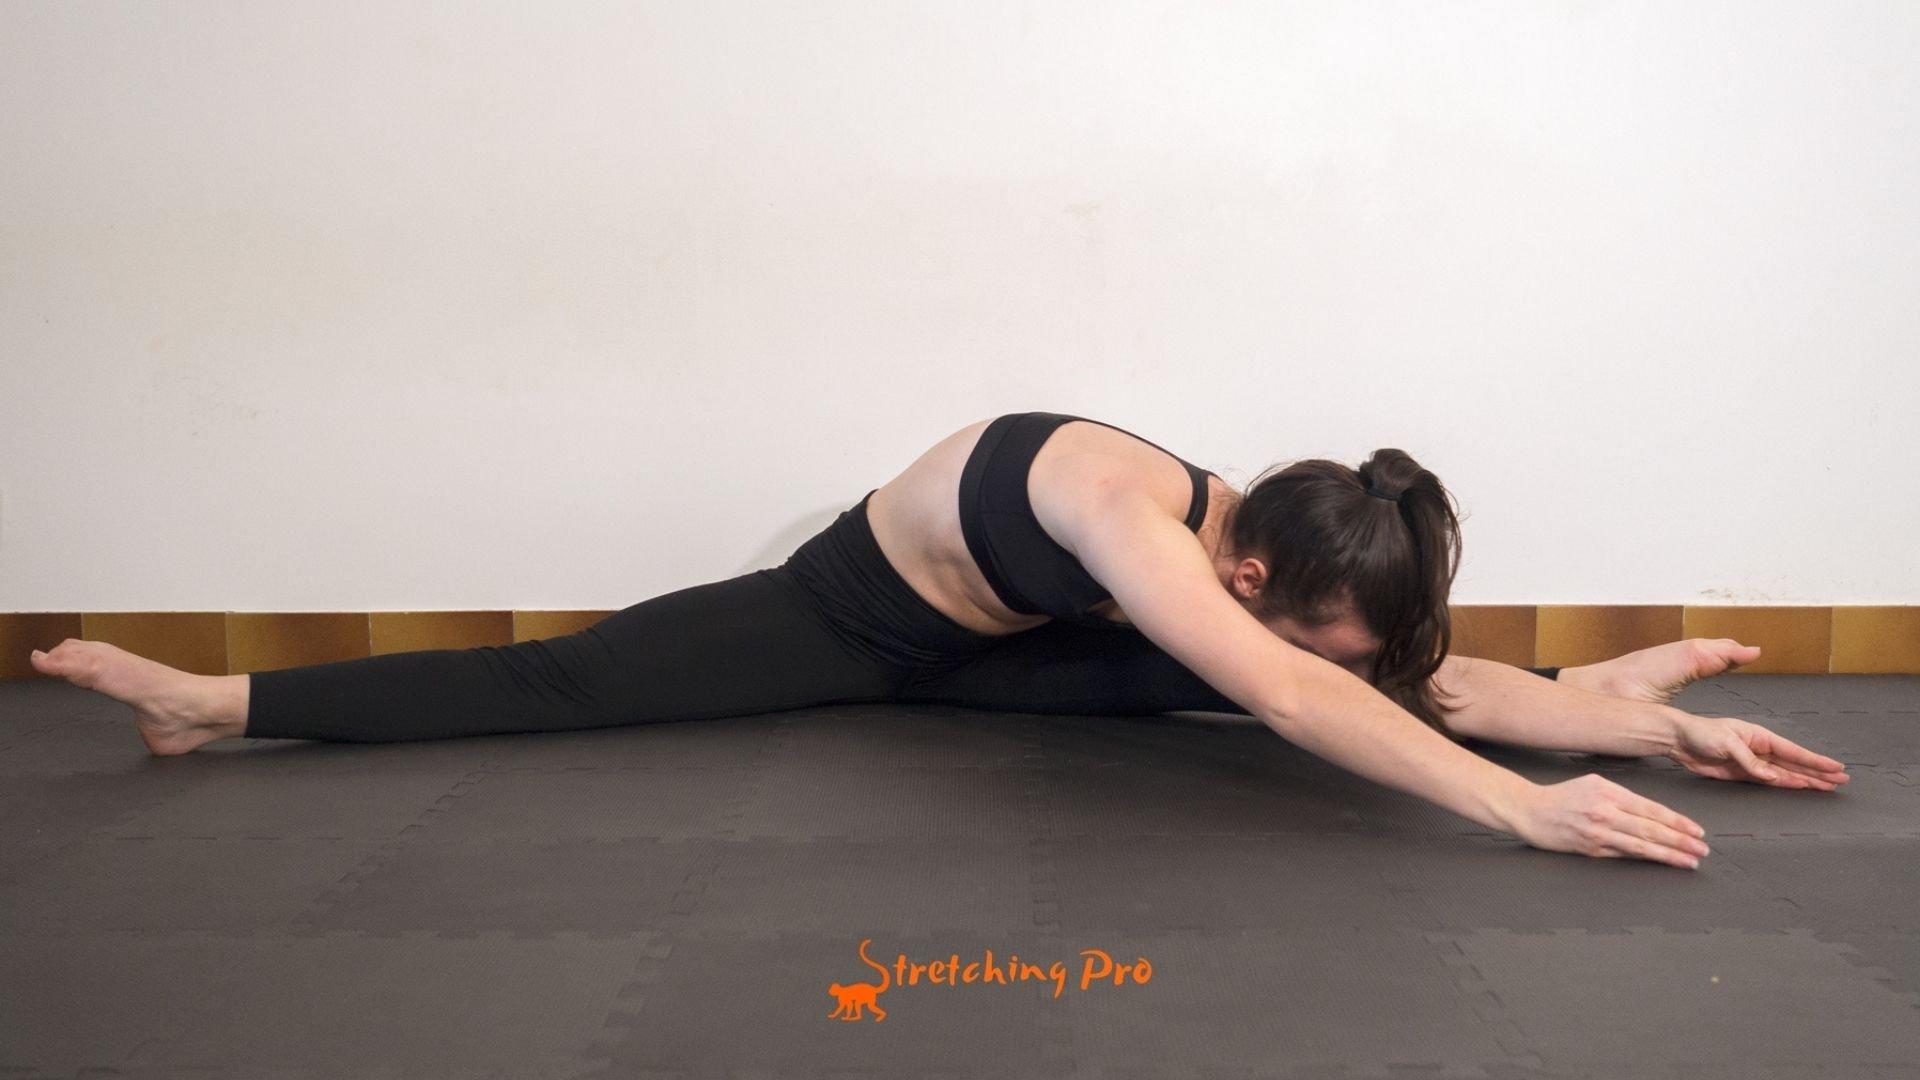 stretchingpro-souplesse-bassin-photo